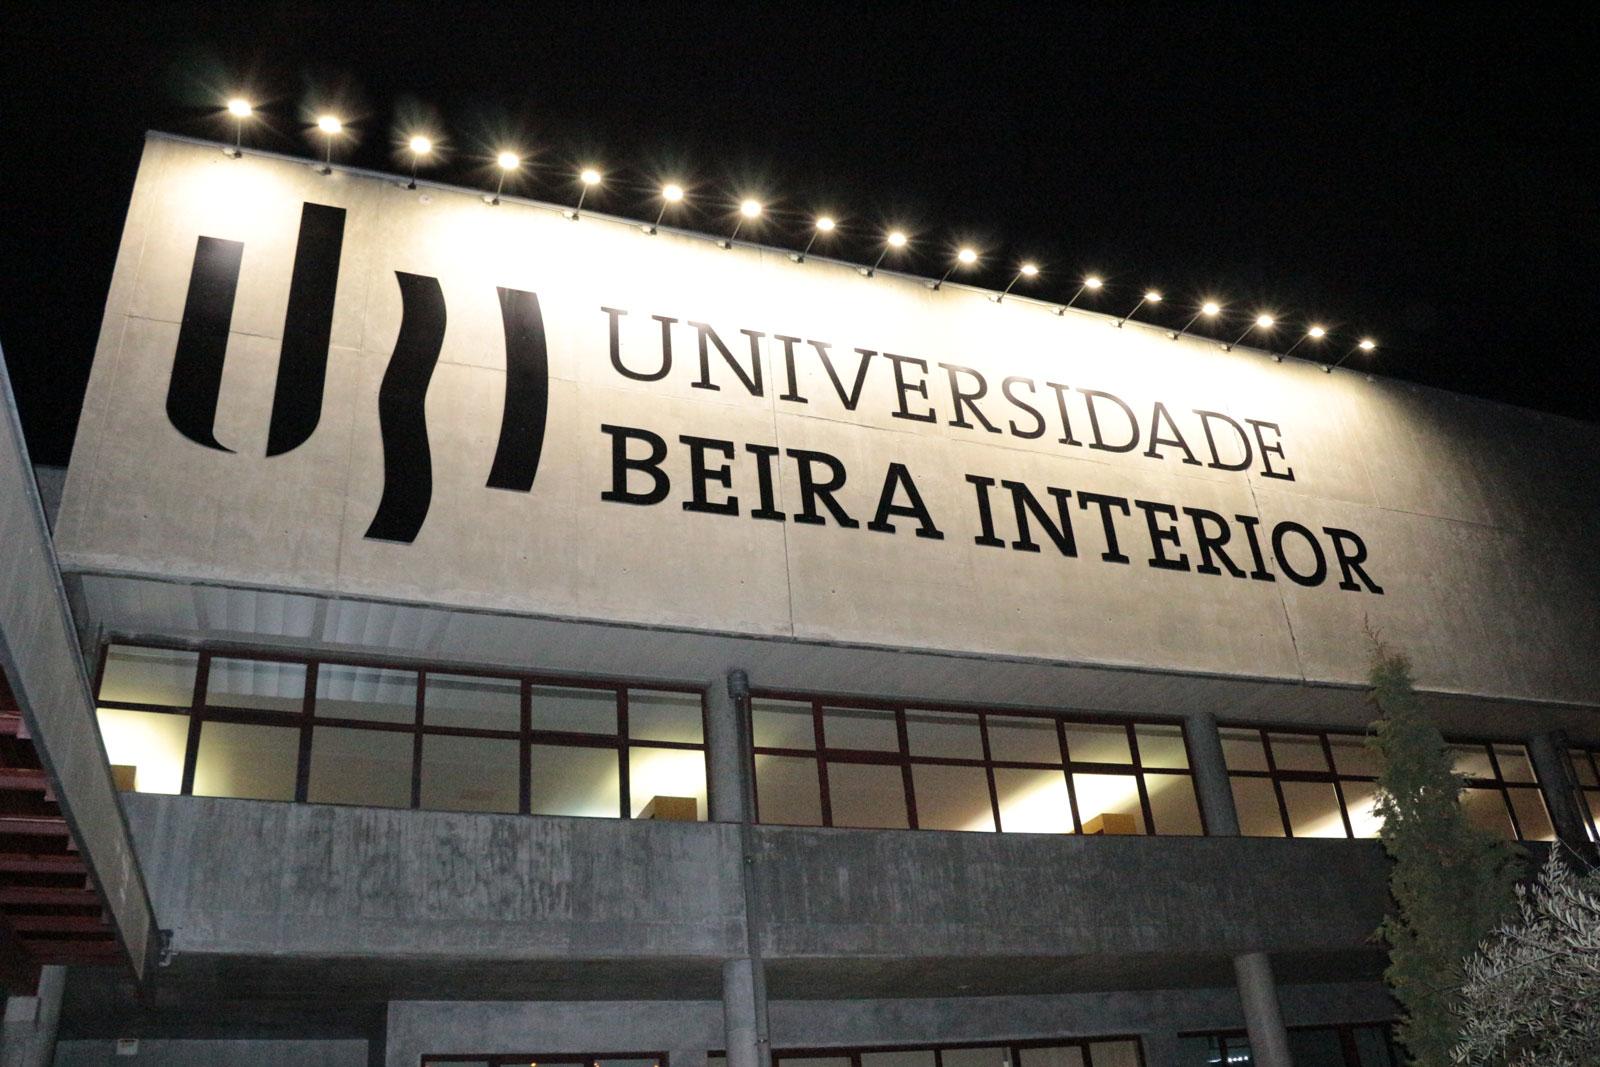 Universidade Beira Interior